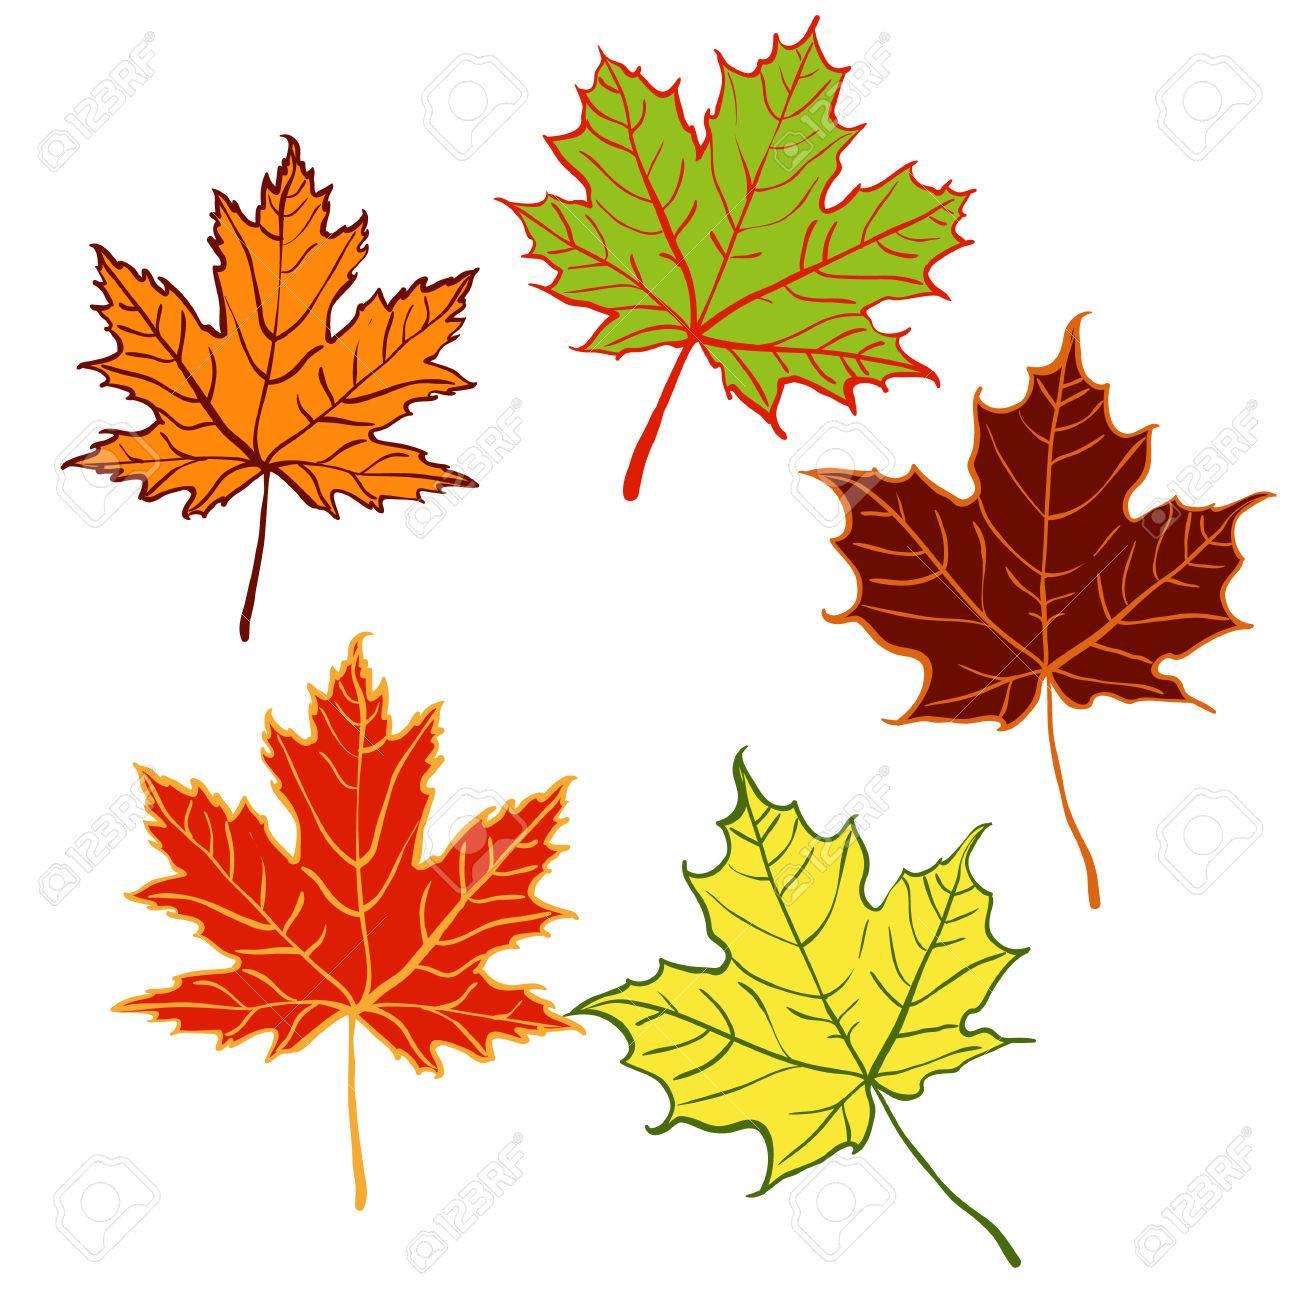 cartoon autumn leaf set of five maple leaves royalty free cliparts rh 123rf com cartoon leaves black and white cartoon leaves falling